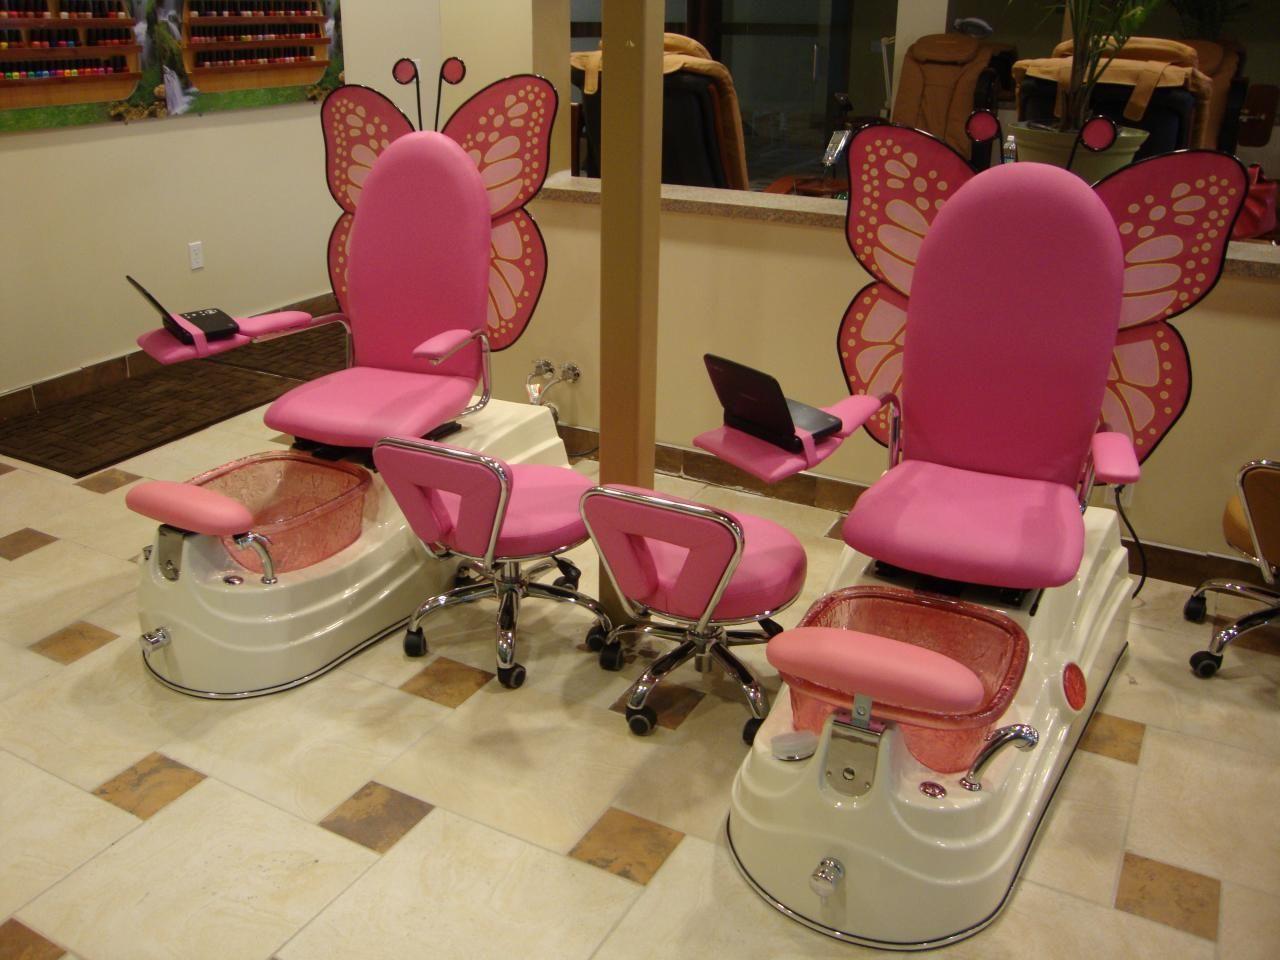 Groovy Pedicure Massage Chair For Sale Pedicure Chairs Pedicure Inzonedesignstudio Interior Chair Design Inzonedesignstudiocom